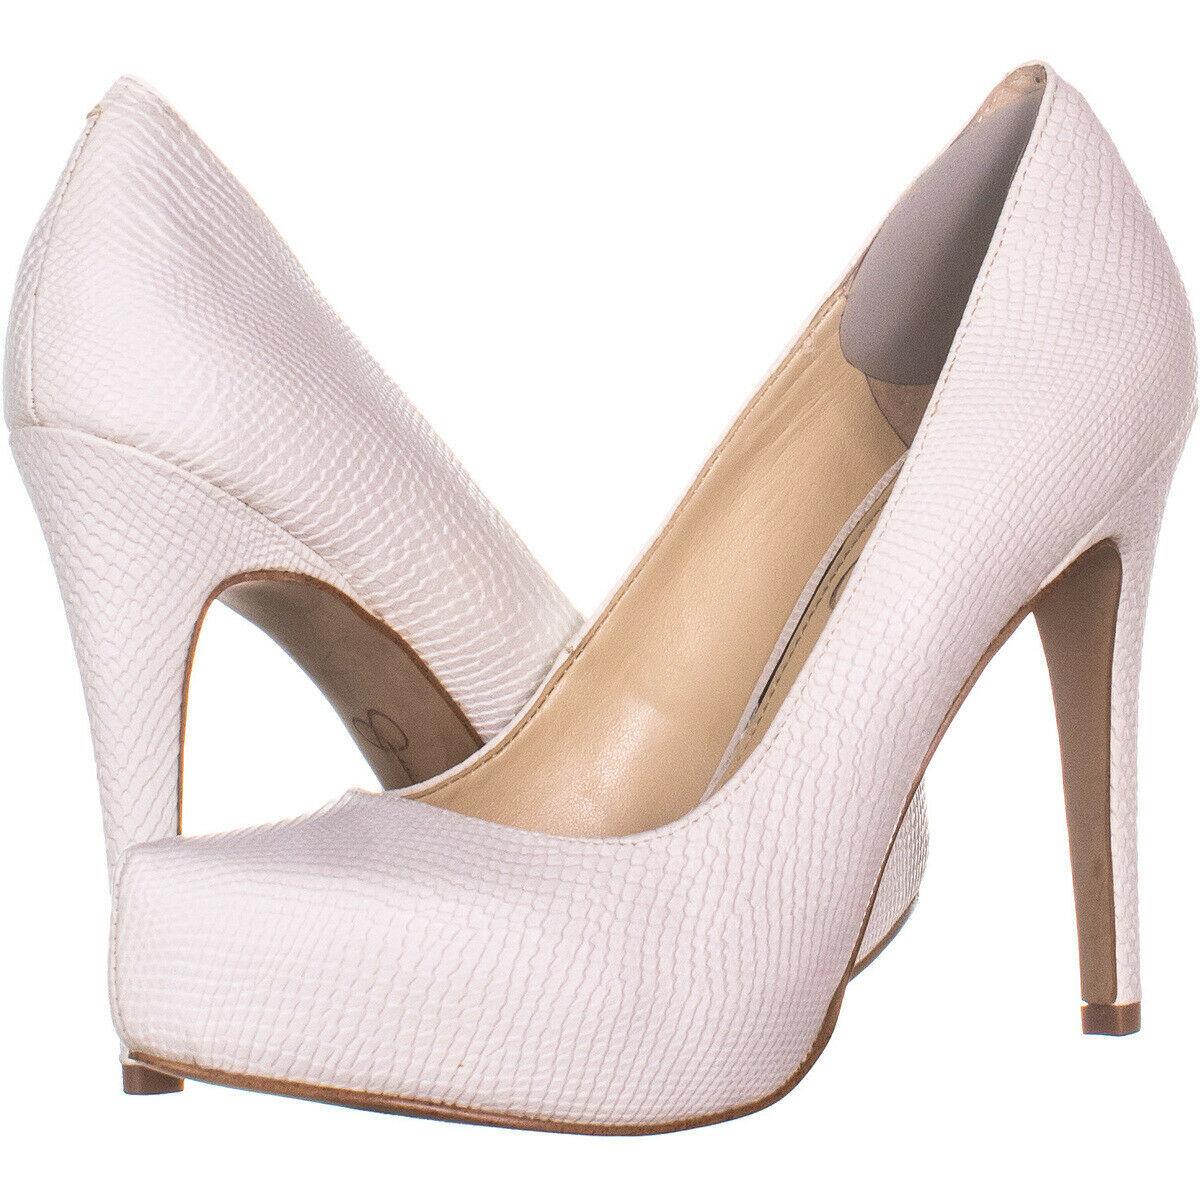 a4fc4eba7 Jessica Simspon Parisah Hidden Platform Heels 136, White, 6.5 US - $21.11